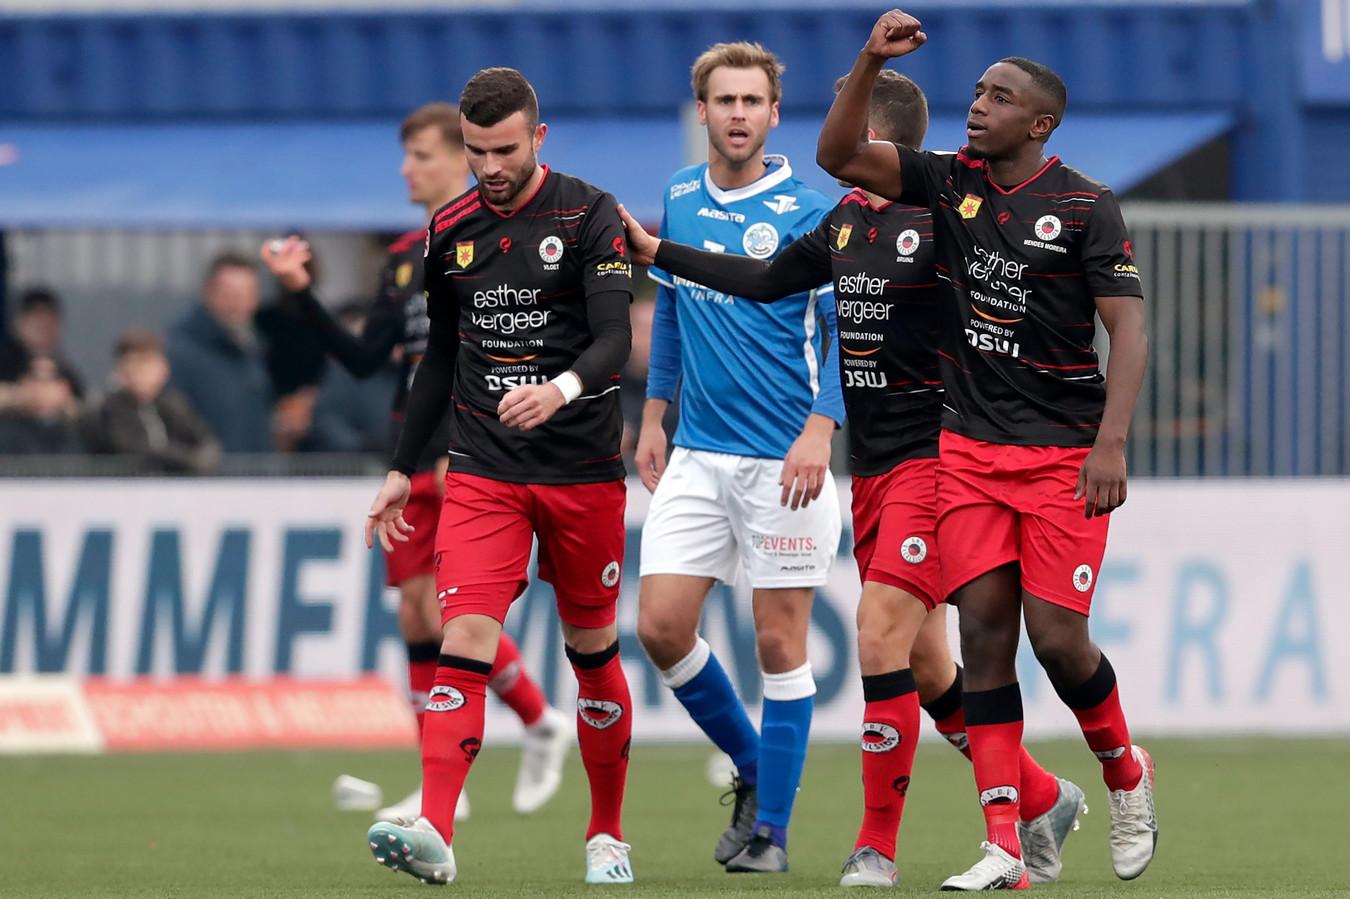 Ahmad Mendes Moreira juicht na zijn goal namens Excelsior tegen FC Den Bosch afgelopen zondag.